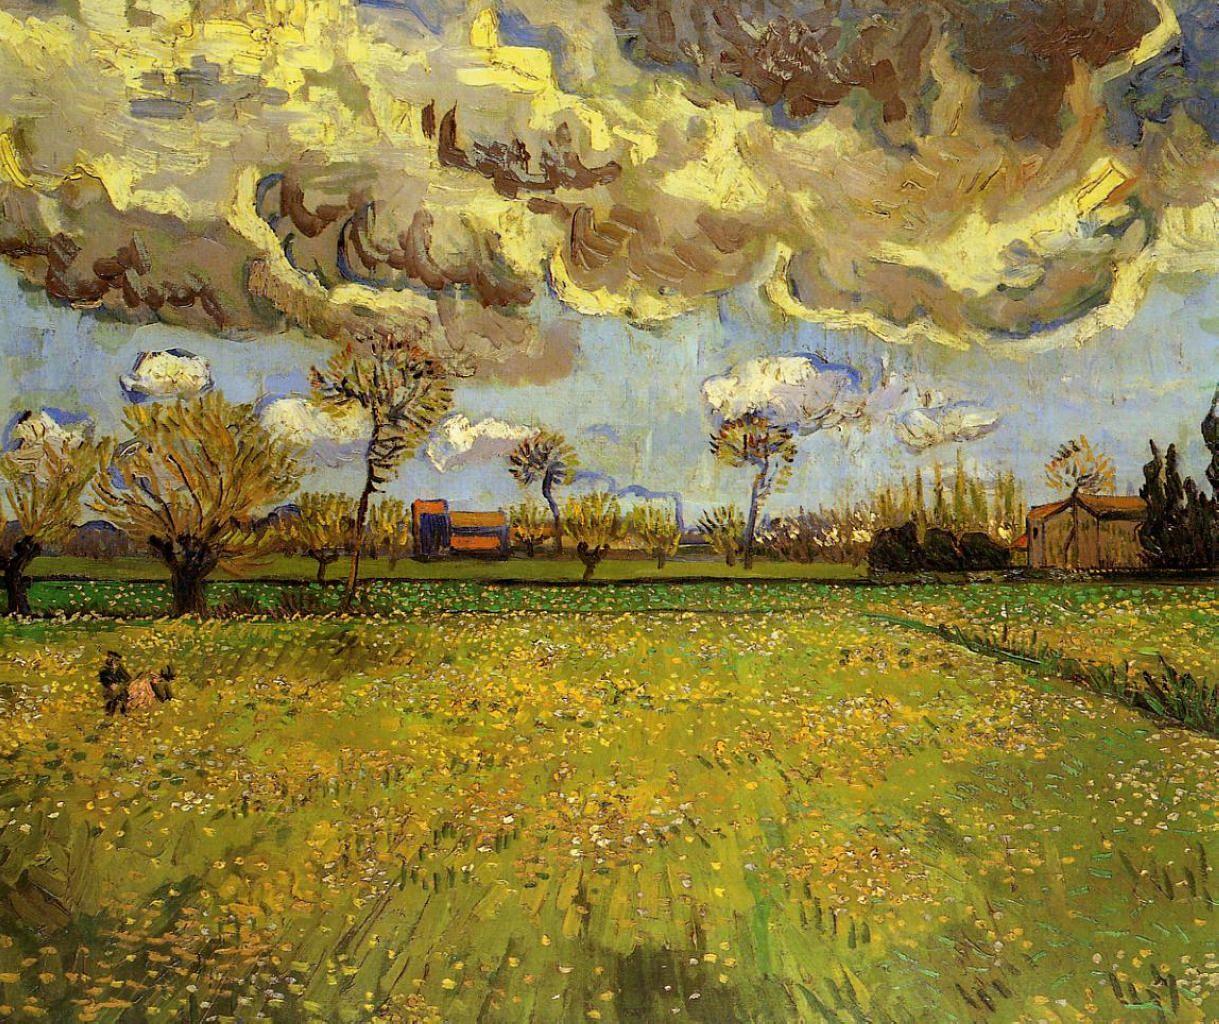 Landscape Under A Stormy Sky Vincent Van Gogh Wikiart Org Van Gogh Landscapes Artist Van Gogh Van Gogh Art